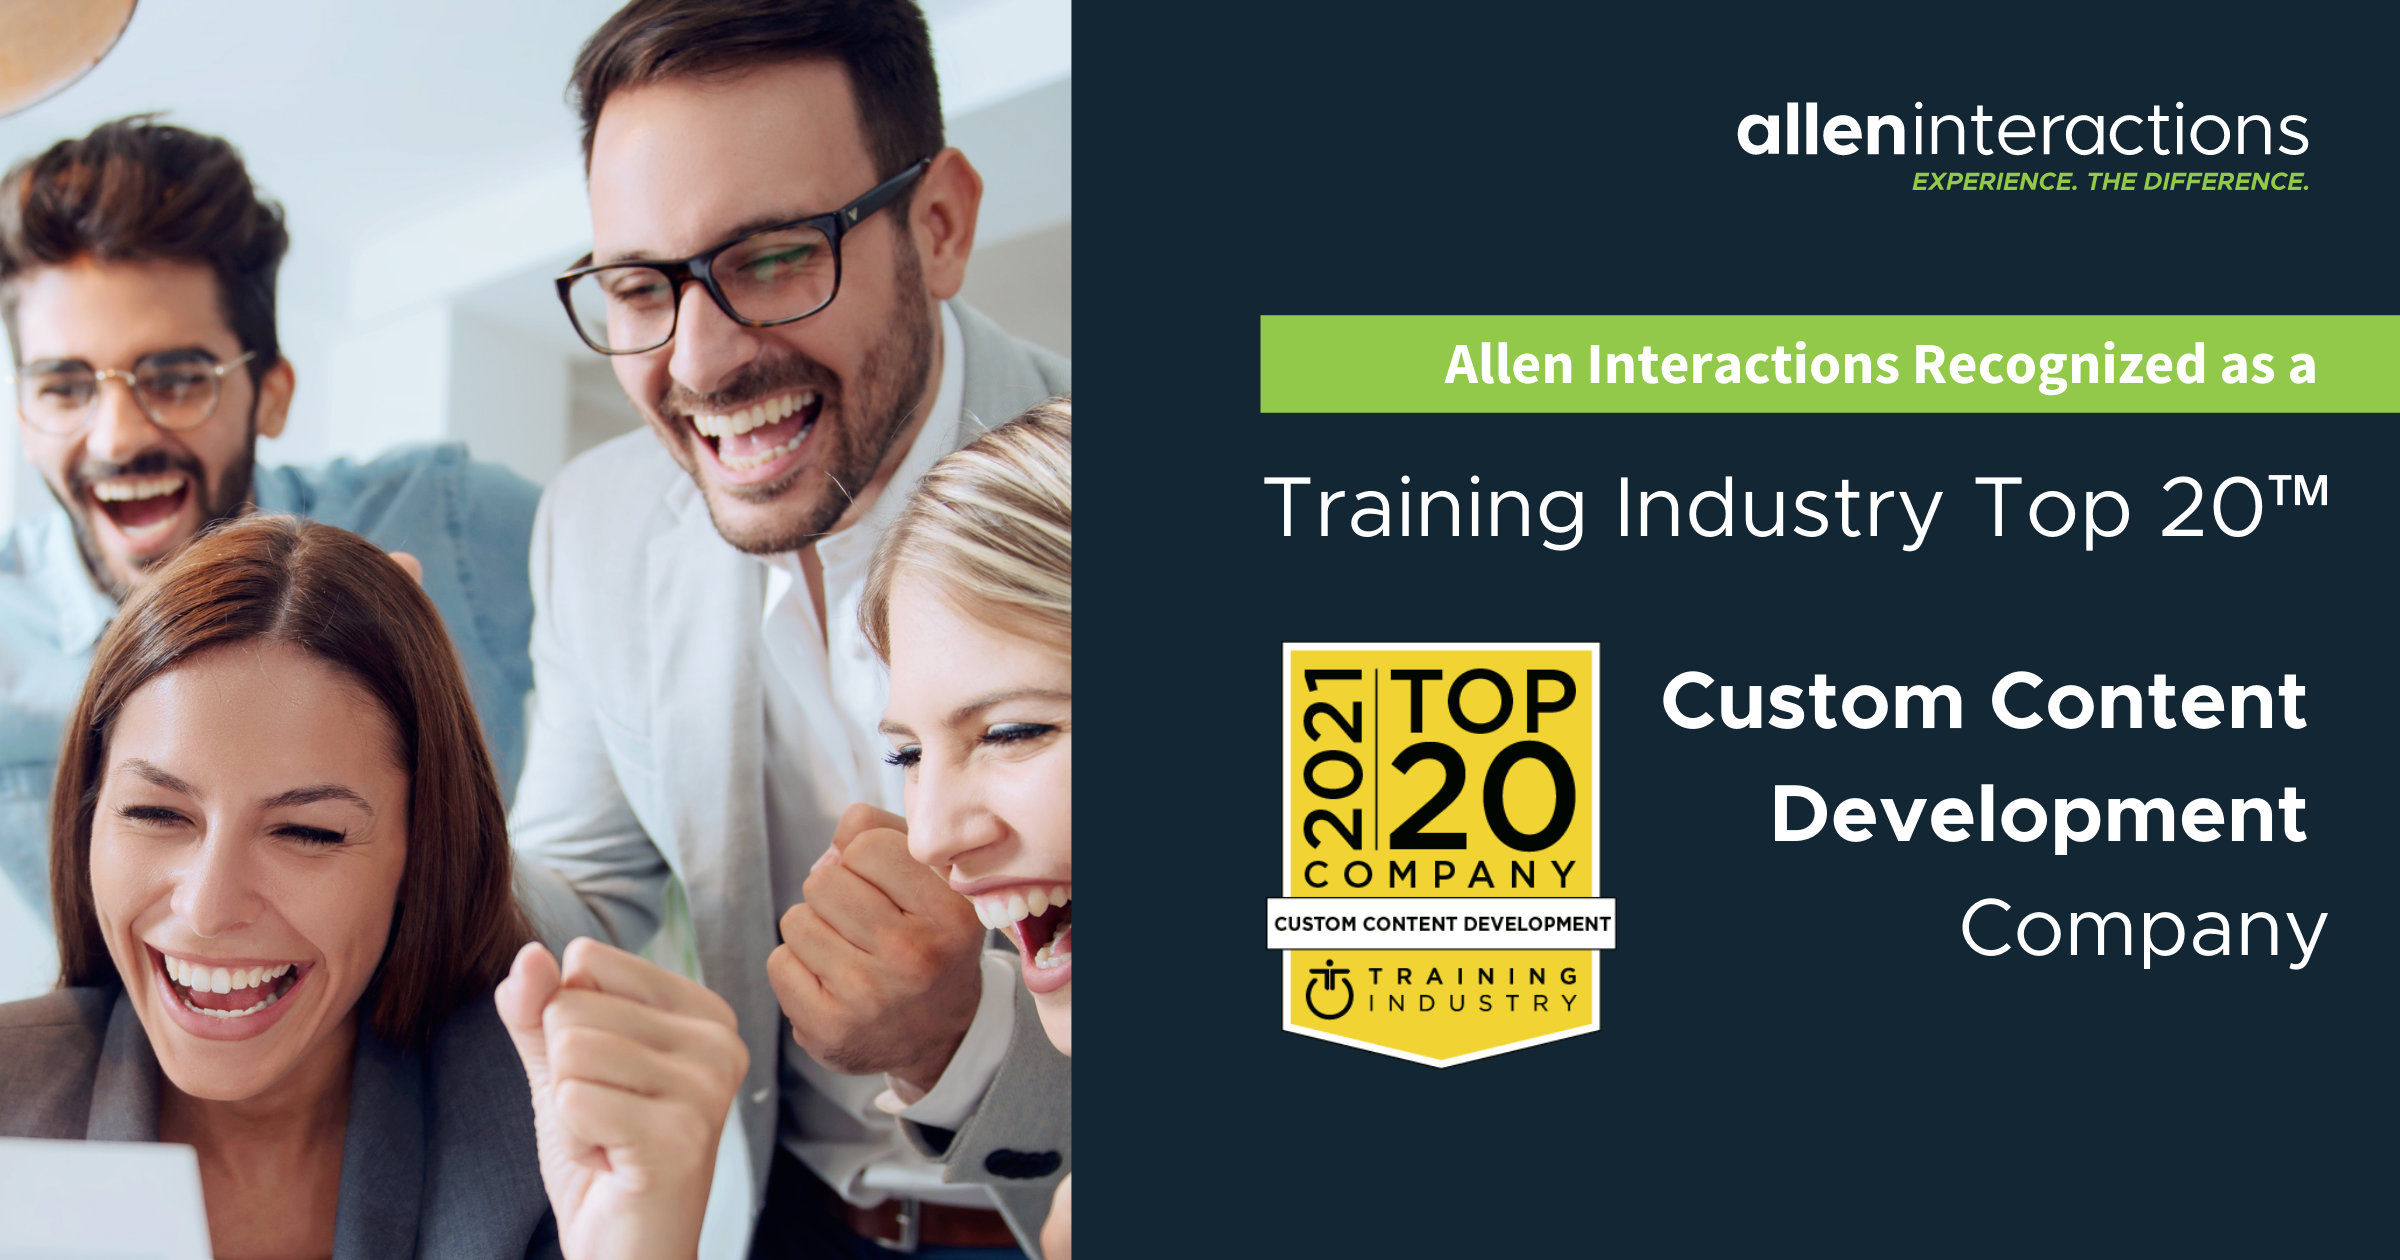 Allen Interactions Recognized by Training Industry asTop 20™ Custom Content DevelopmentCompany